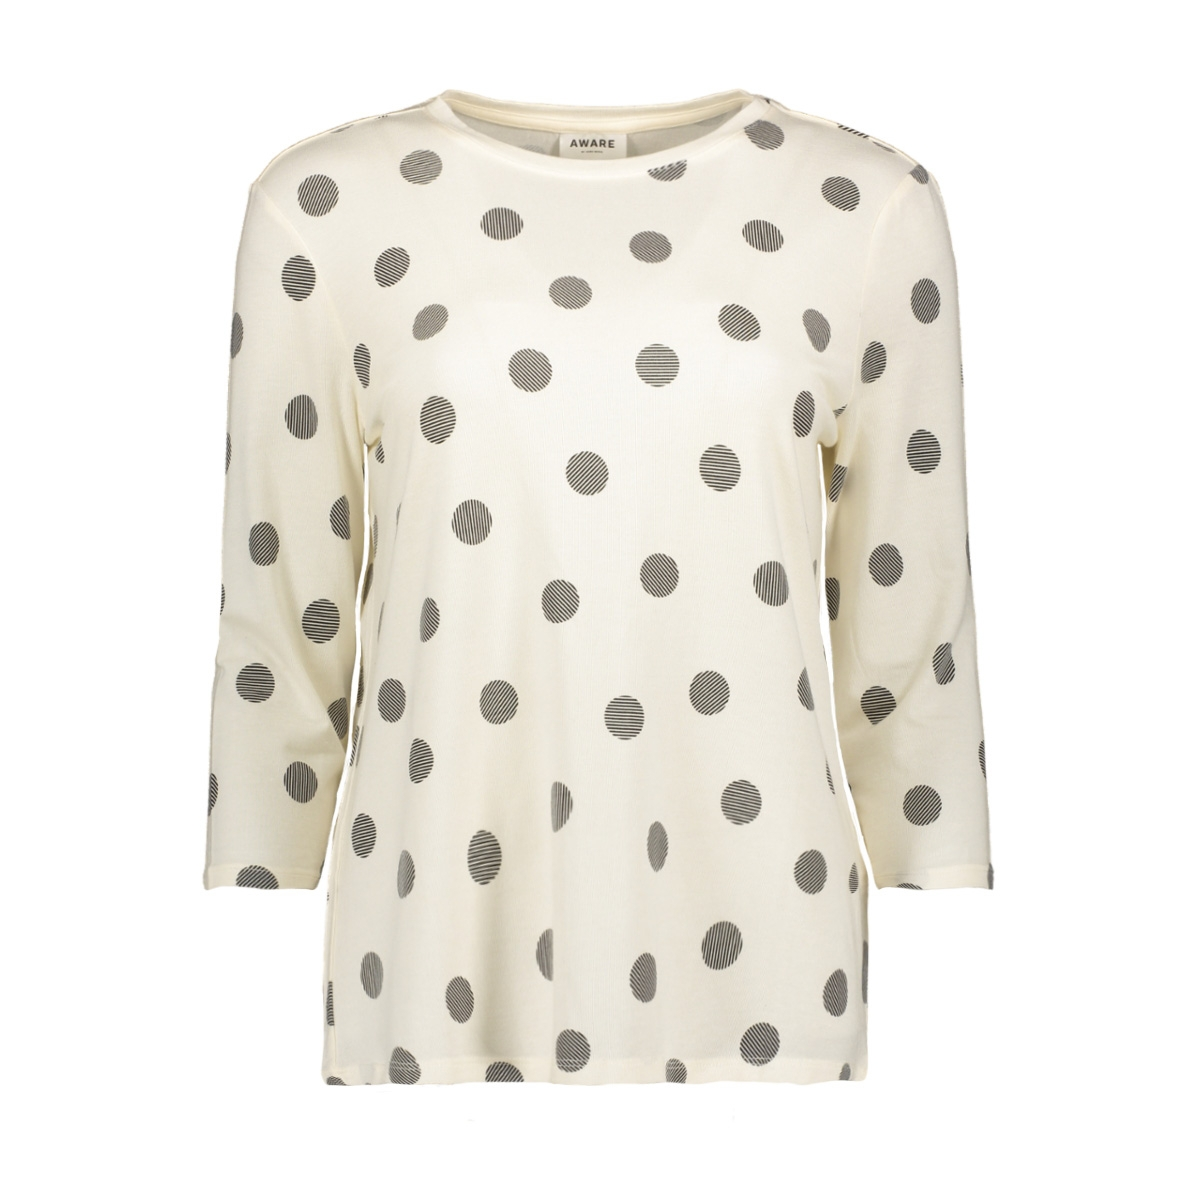 vmava 3/4 dot top ga 10209920 vero moda t-shirt pristine/demi black